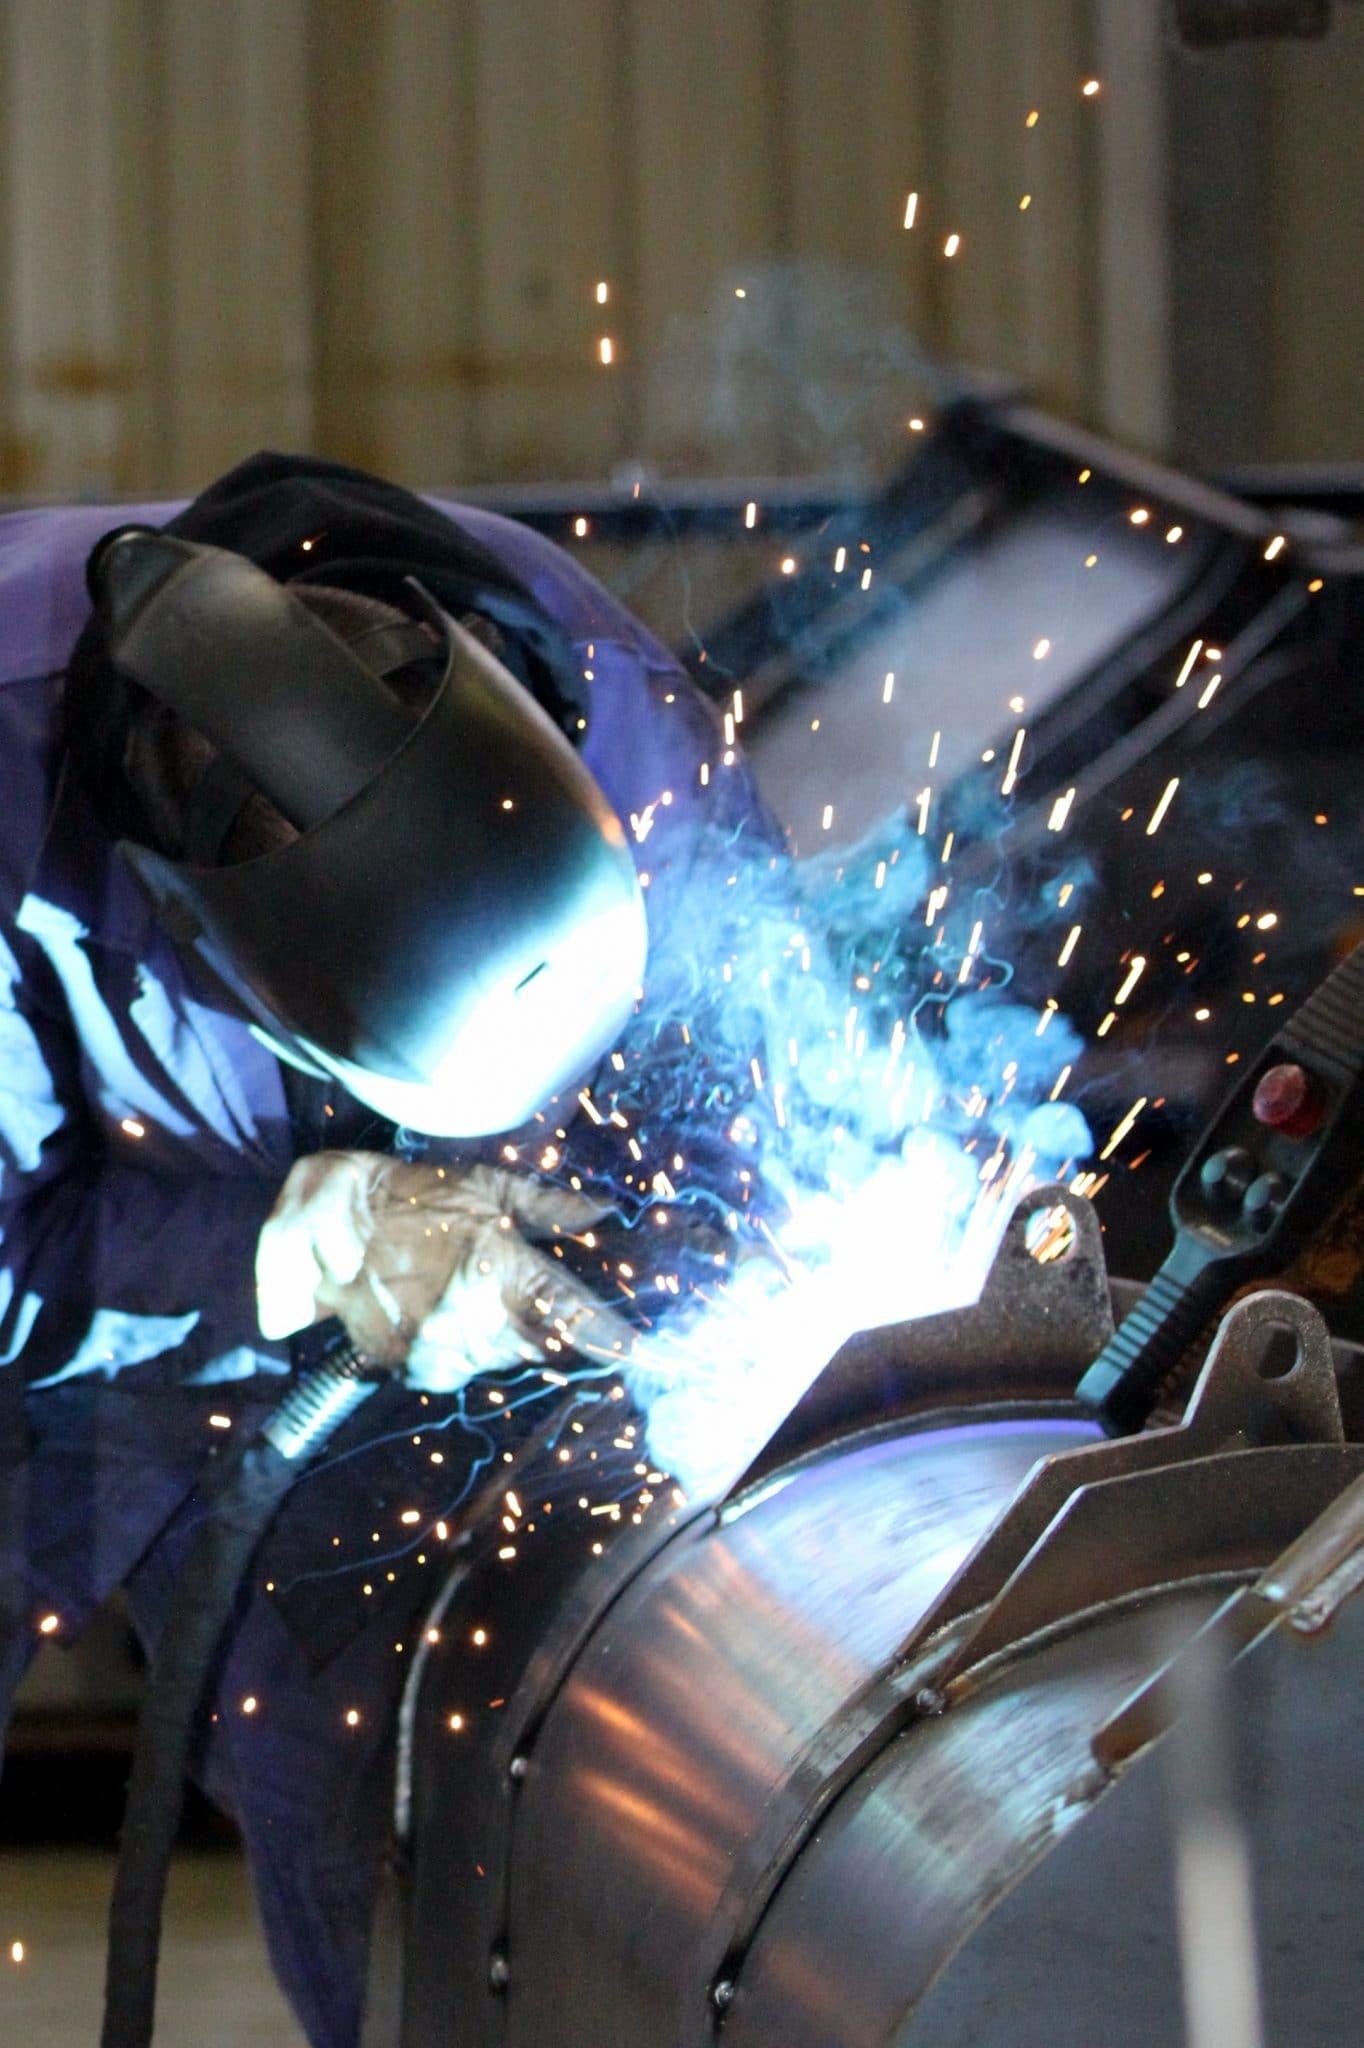 Prototype welding